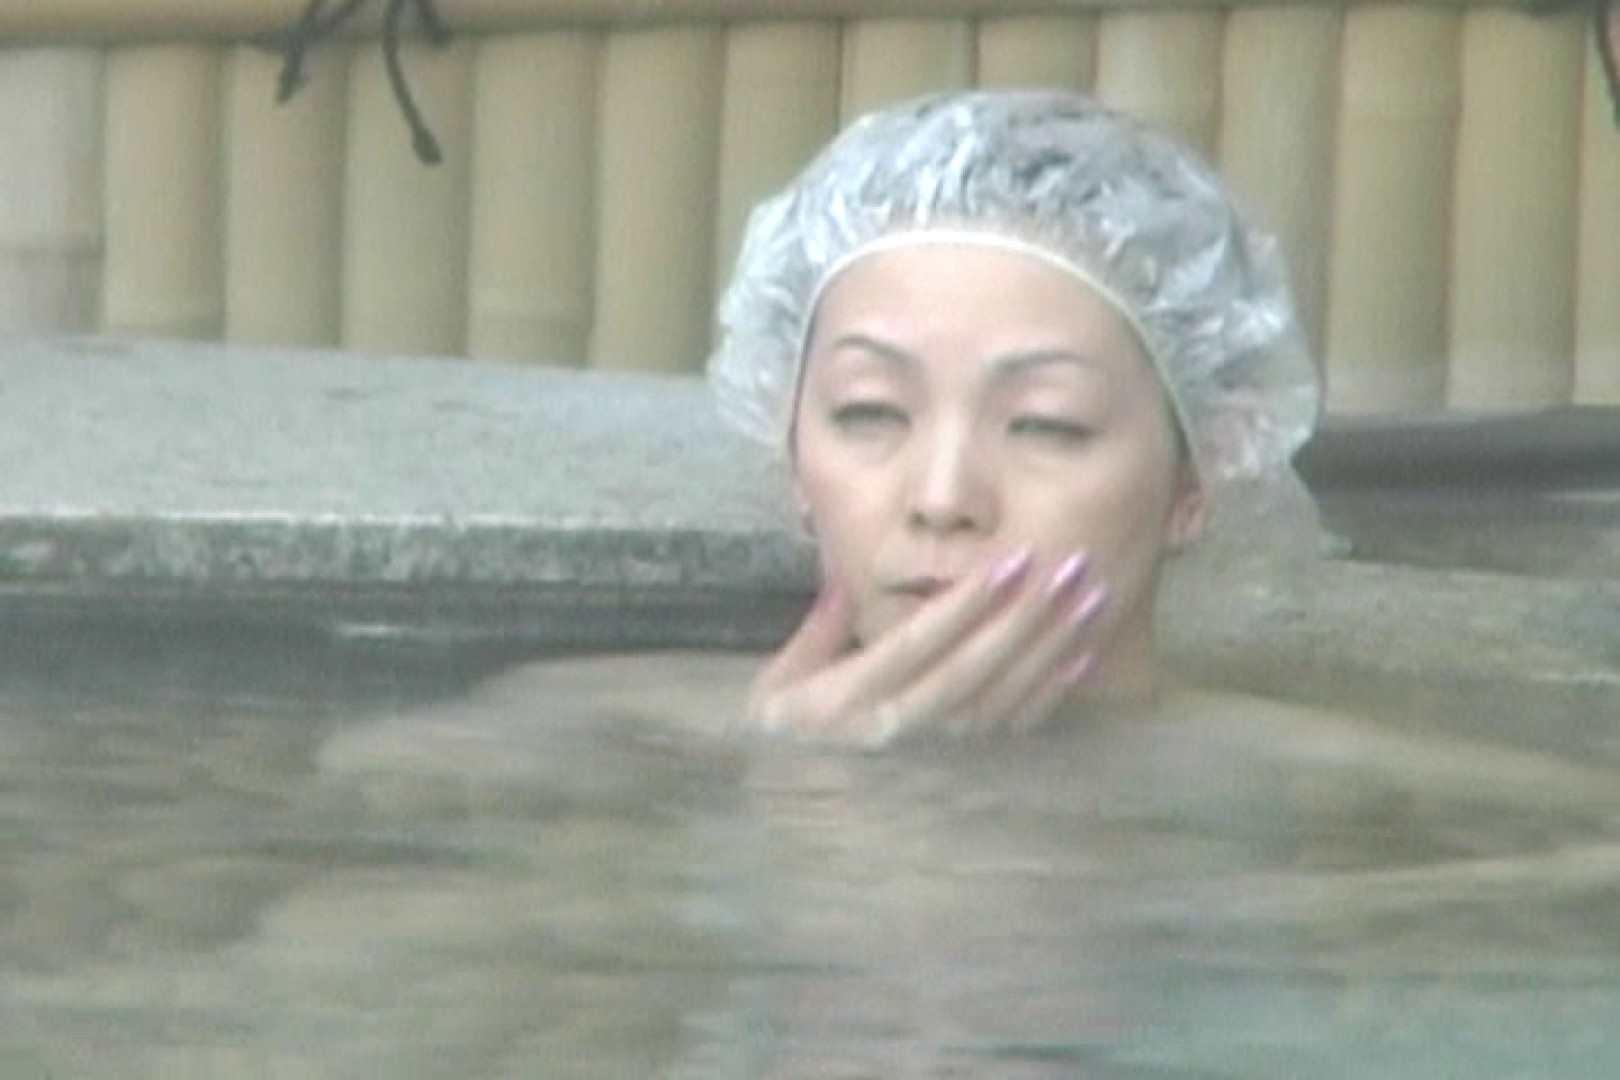 Aquaな露天風呂Vol.592 盗撮特撮 おまんこ動画流出 12pic 8